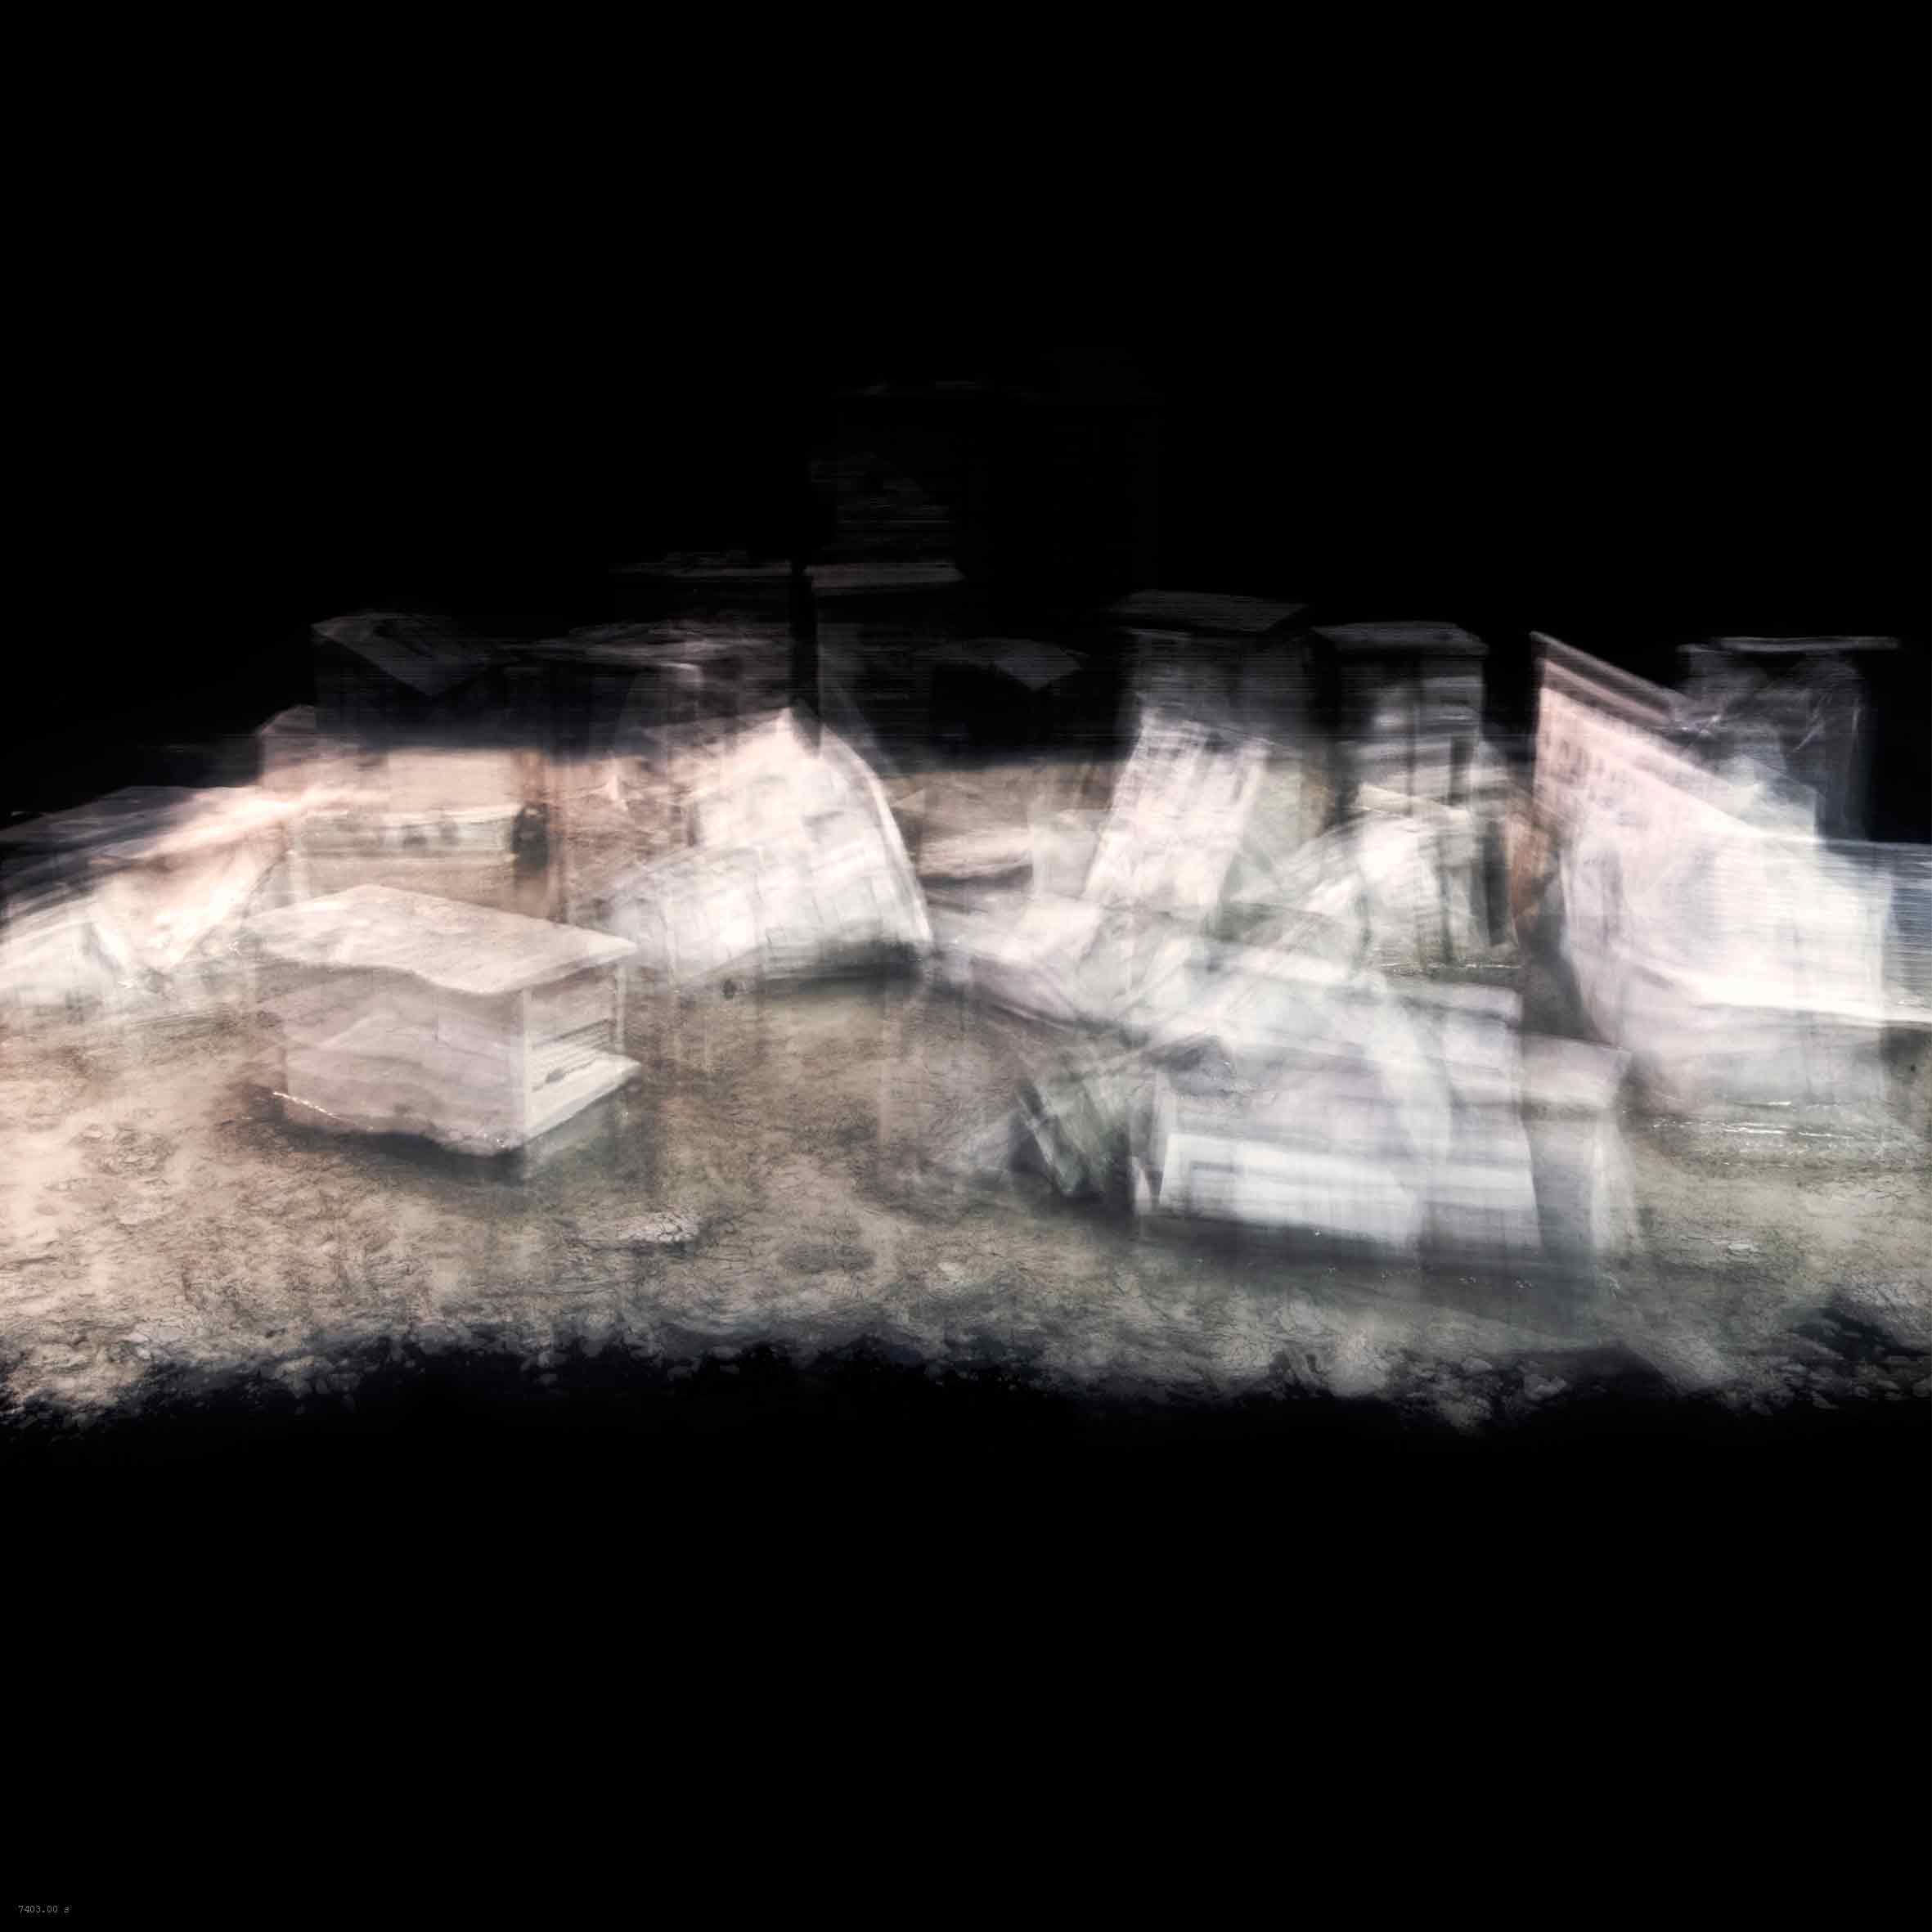 Cyrus Tang,  7403.00s , 2016, archival giclee print, 90 x 90cm.